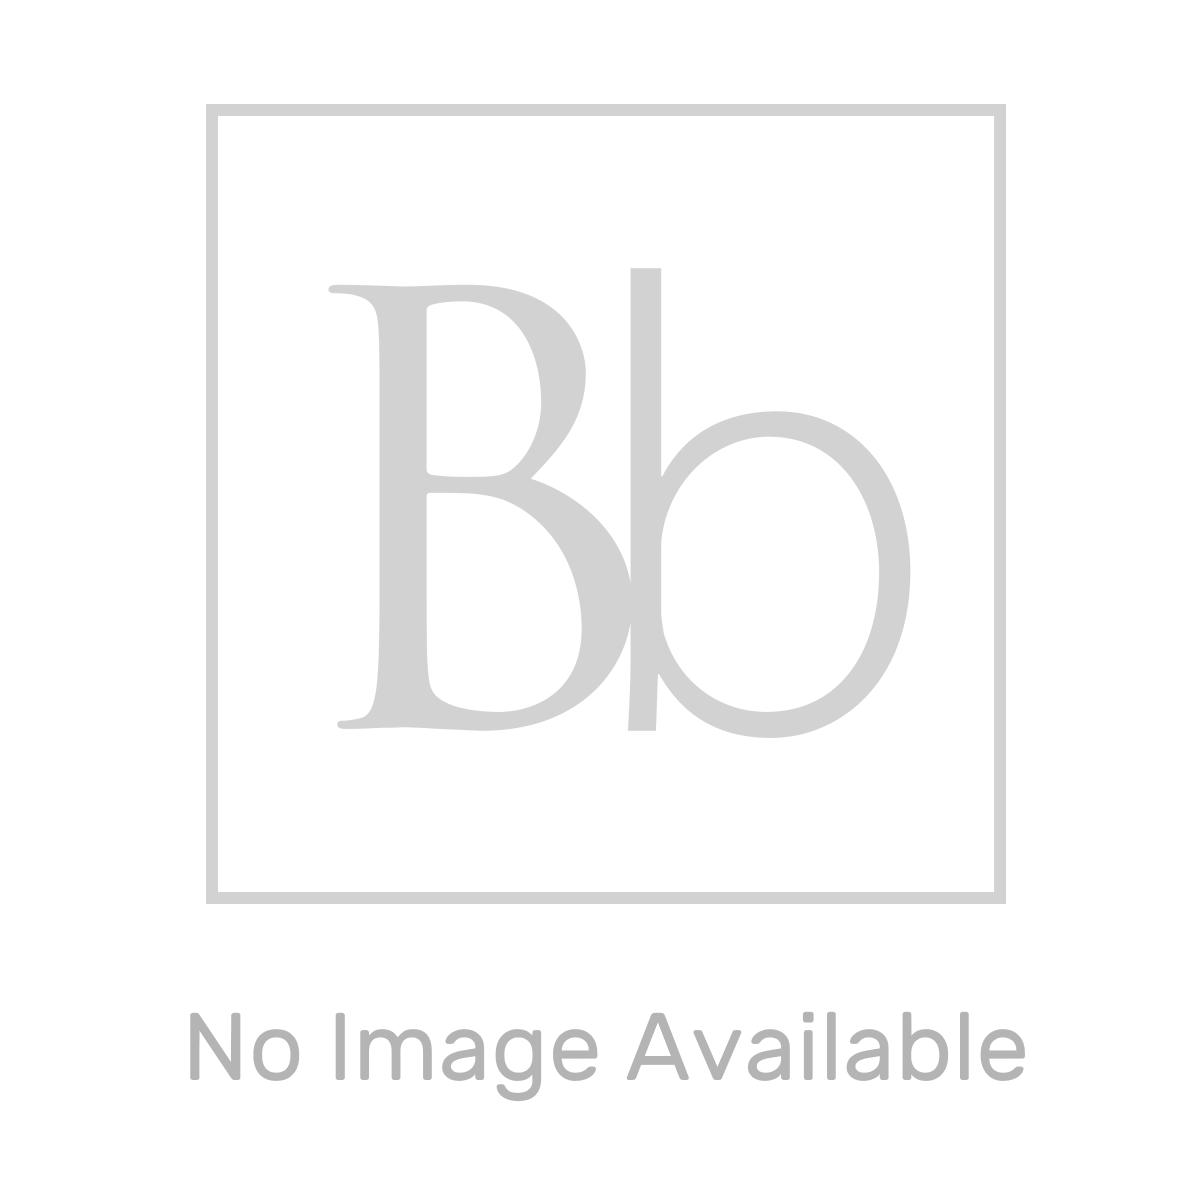 April Rectangular Anti Slip Shower Tray 800 x 700 Line Drawing